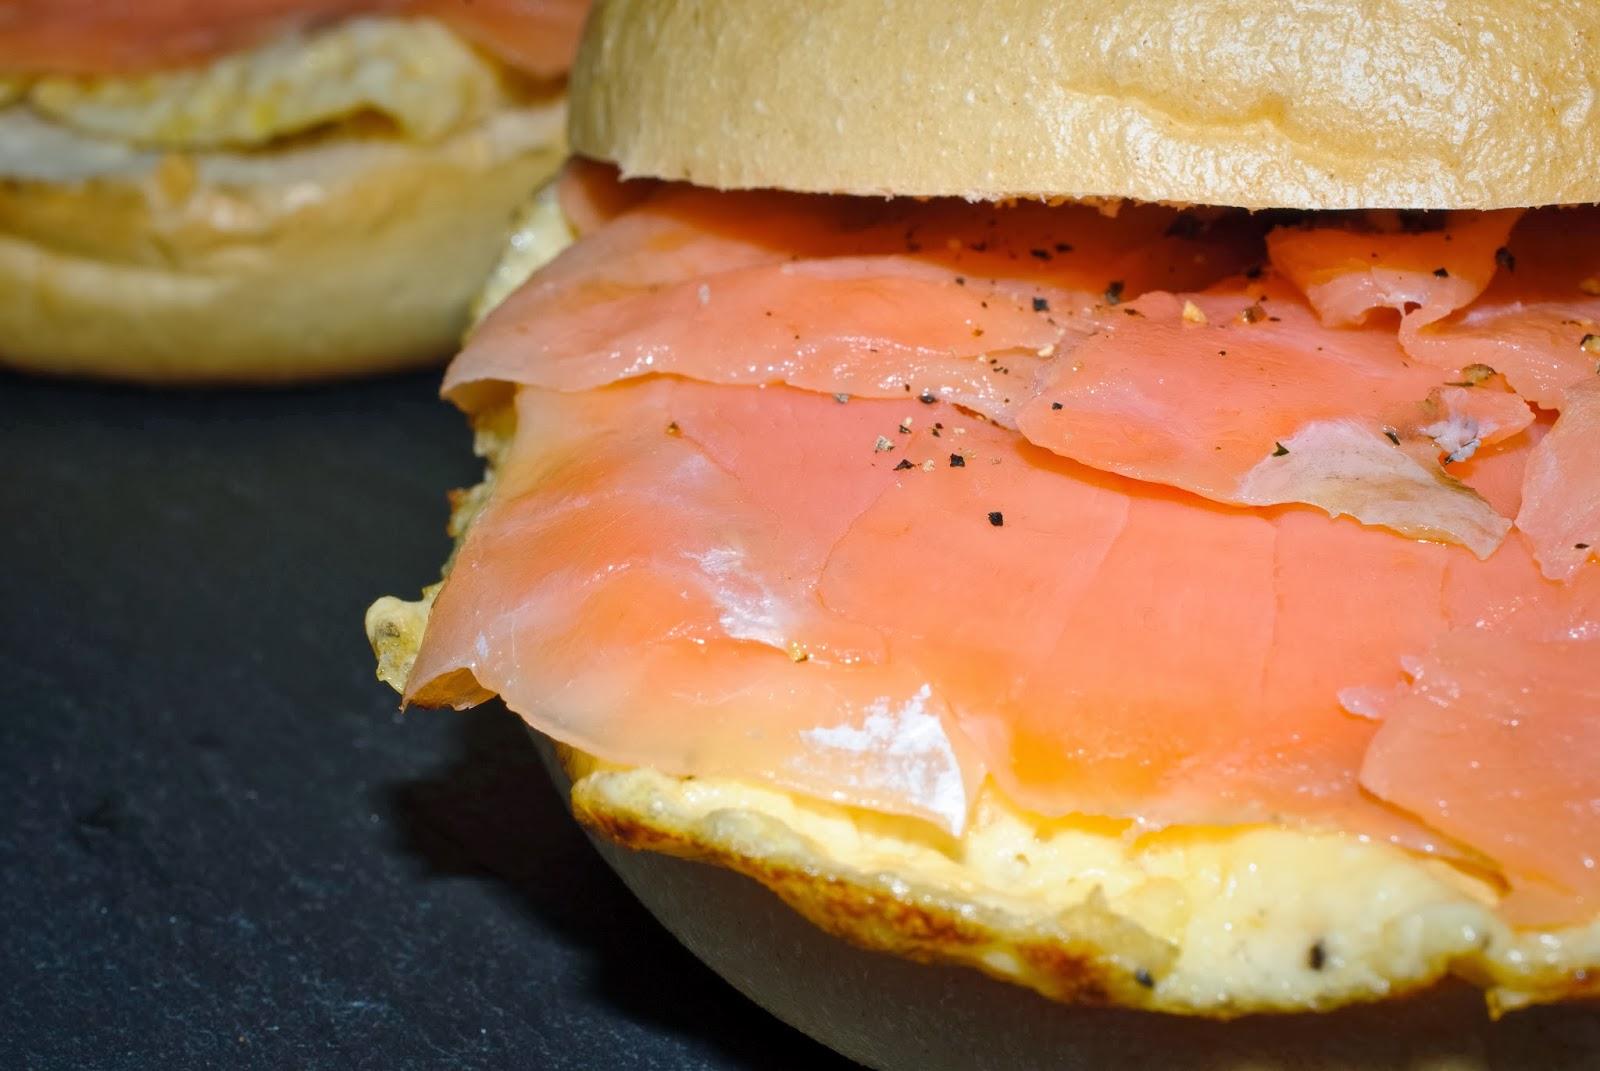 Montadito de salmón ahumado y tortilla; smoked salmon and omelette sandwich